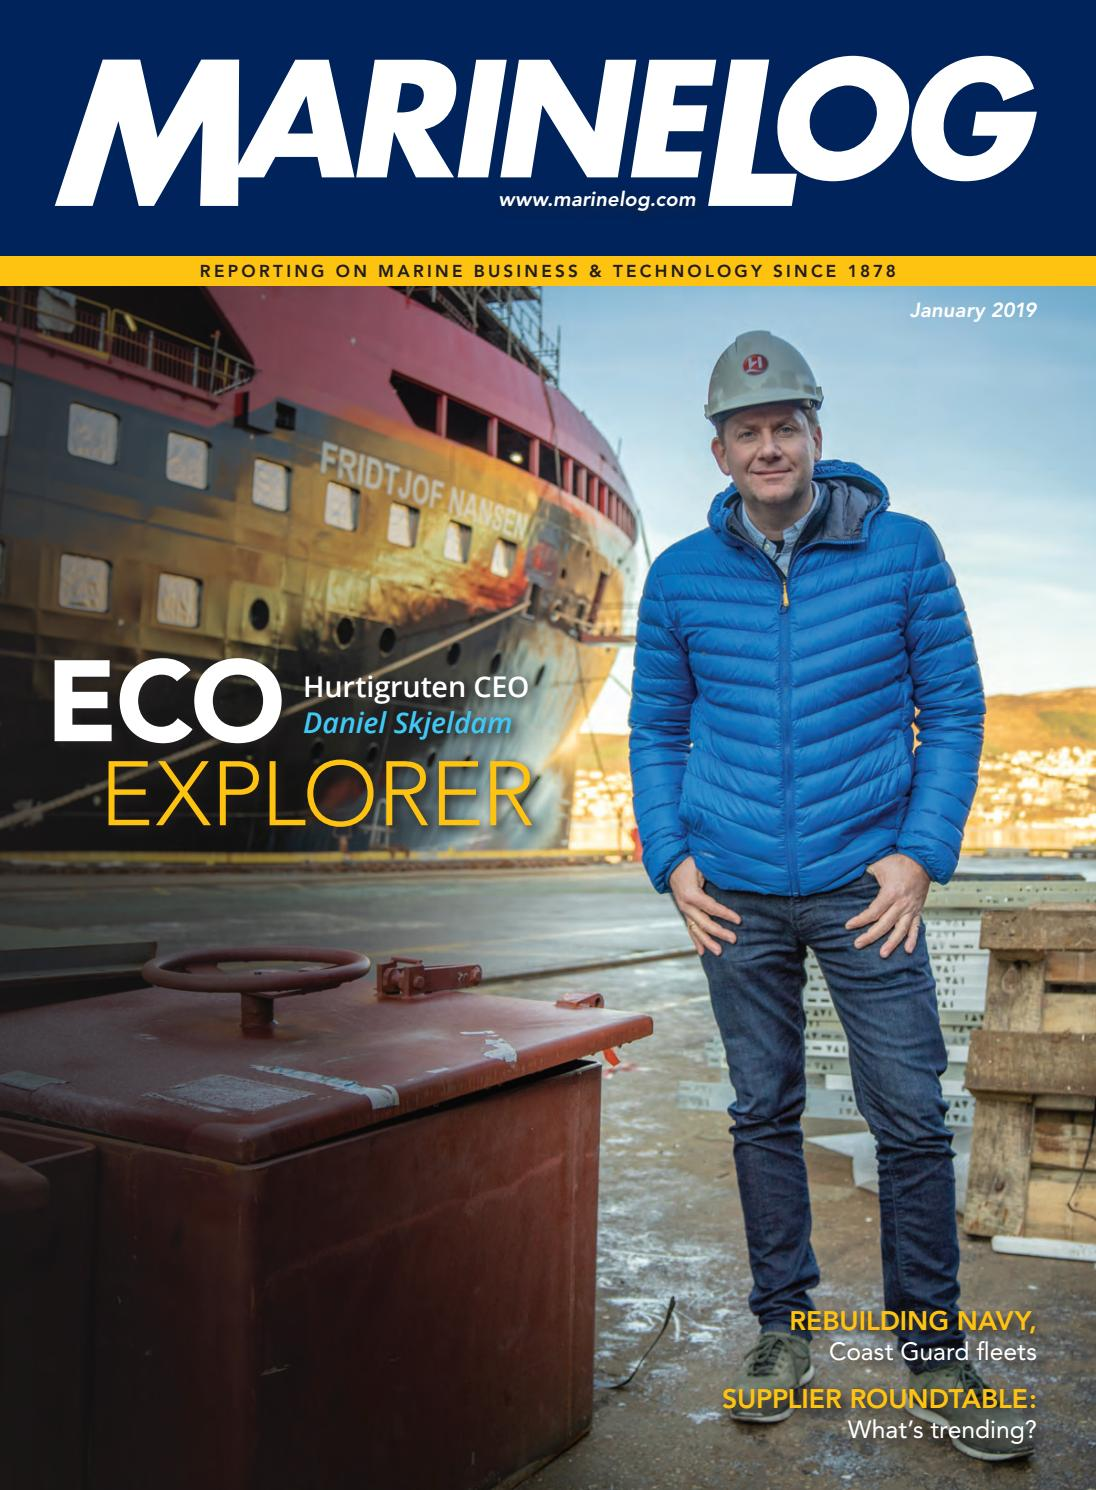 Marine Log January 2019 by Marine Log - issuu